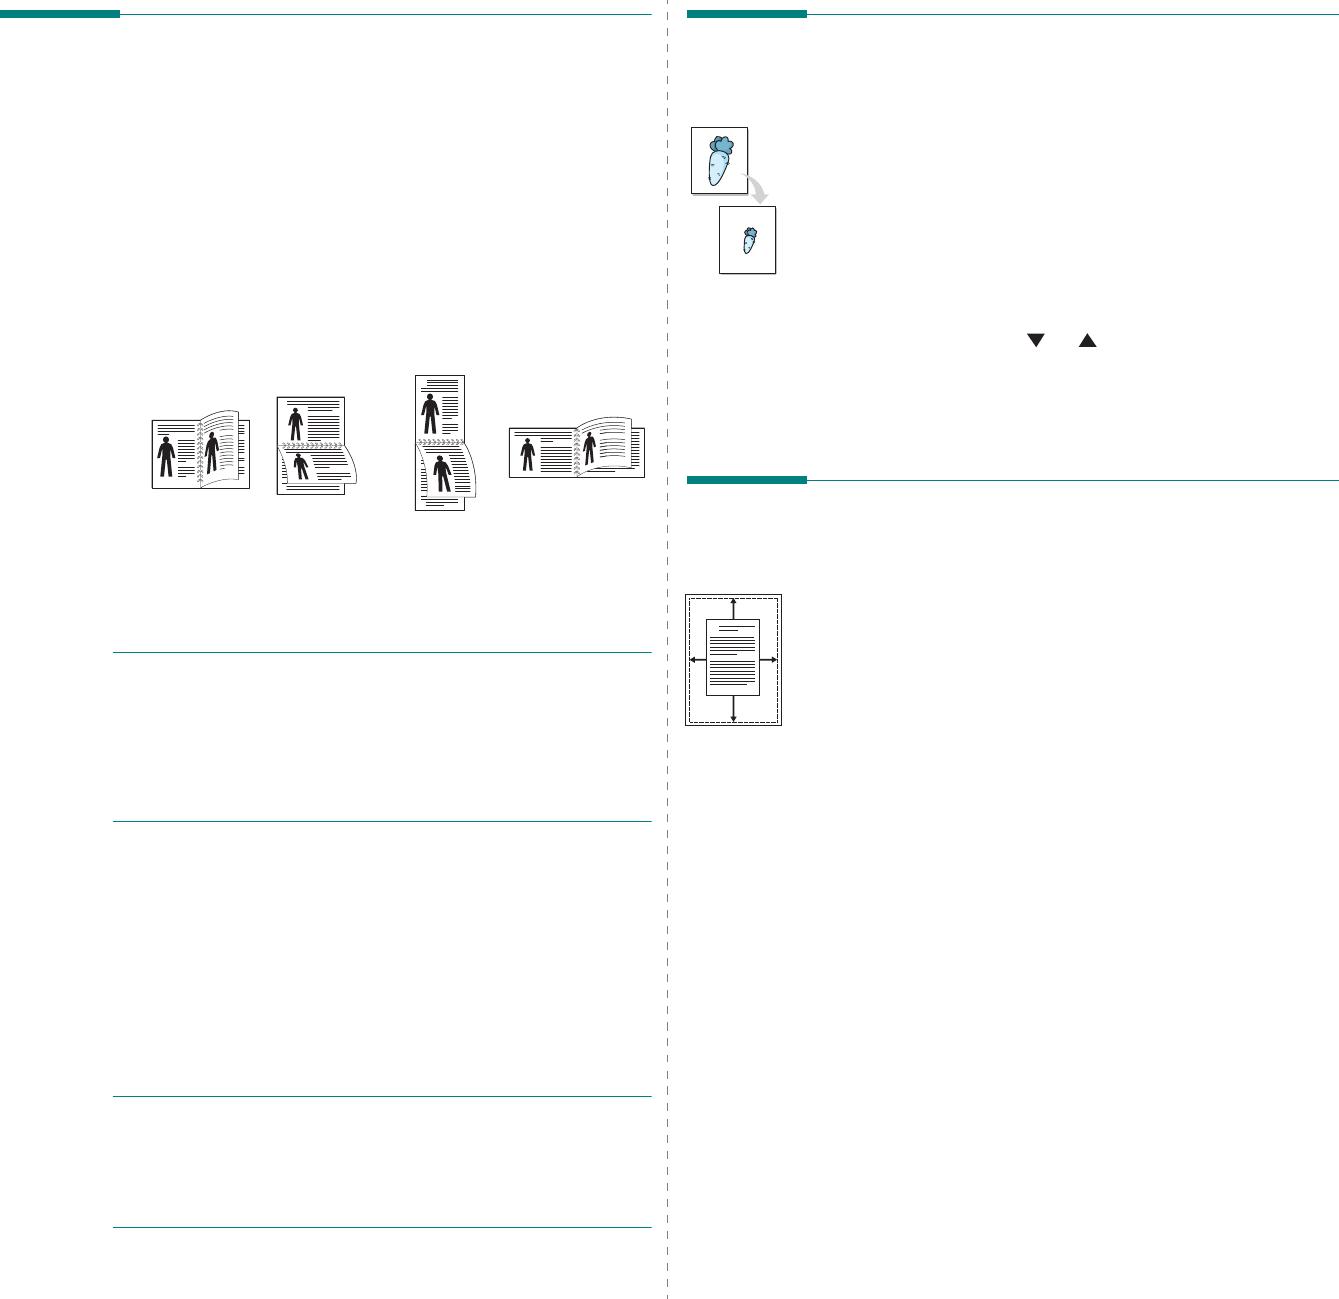 Ricoh Aficio Sp 5100n Users Manual Strap St 3 W Advanced Printing